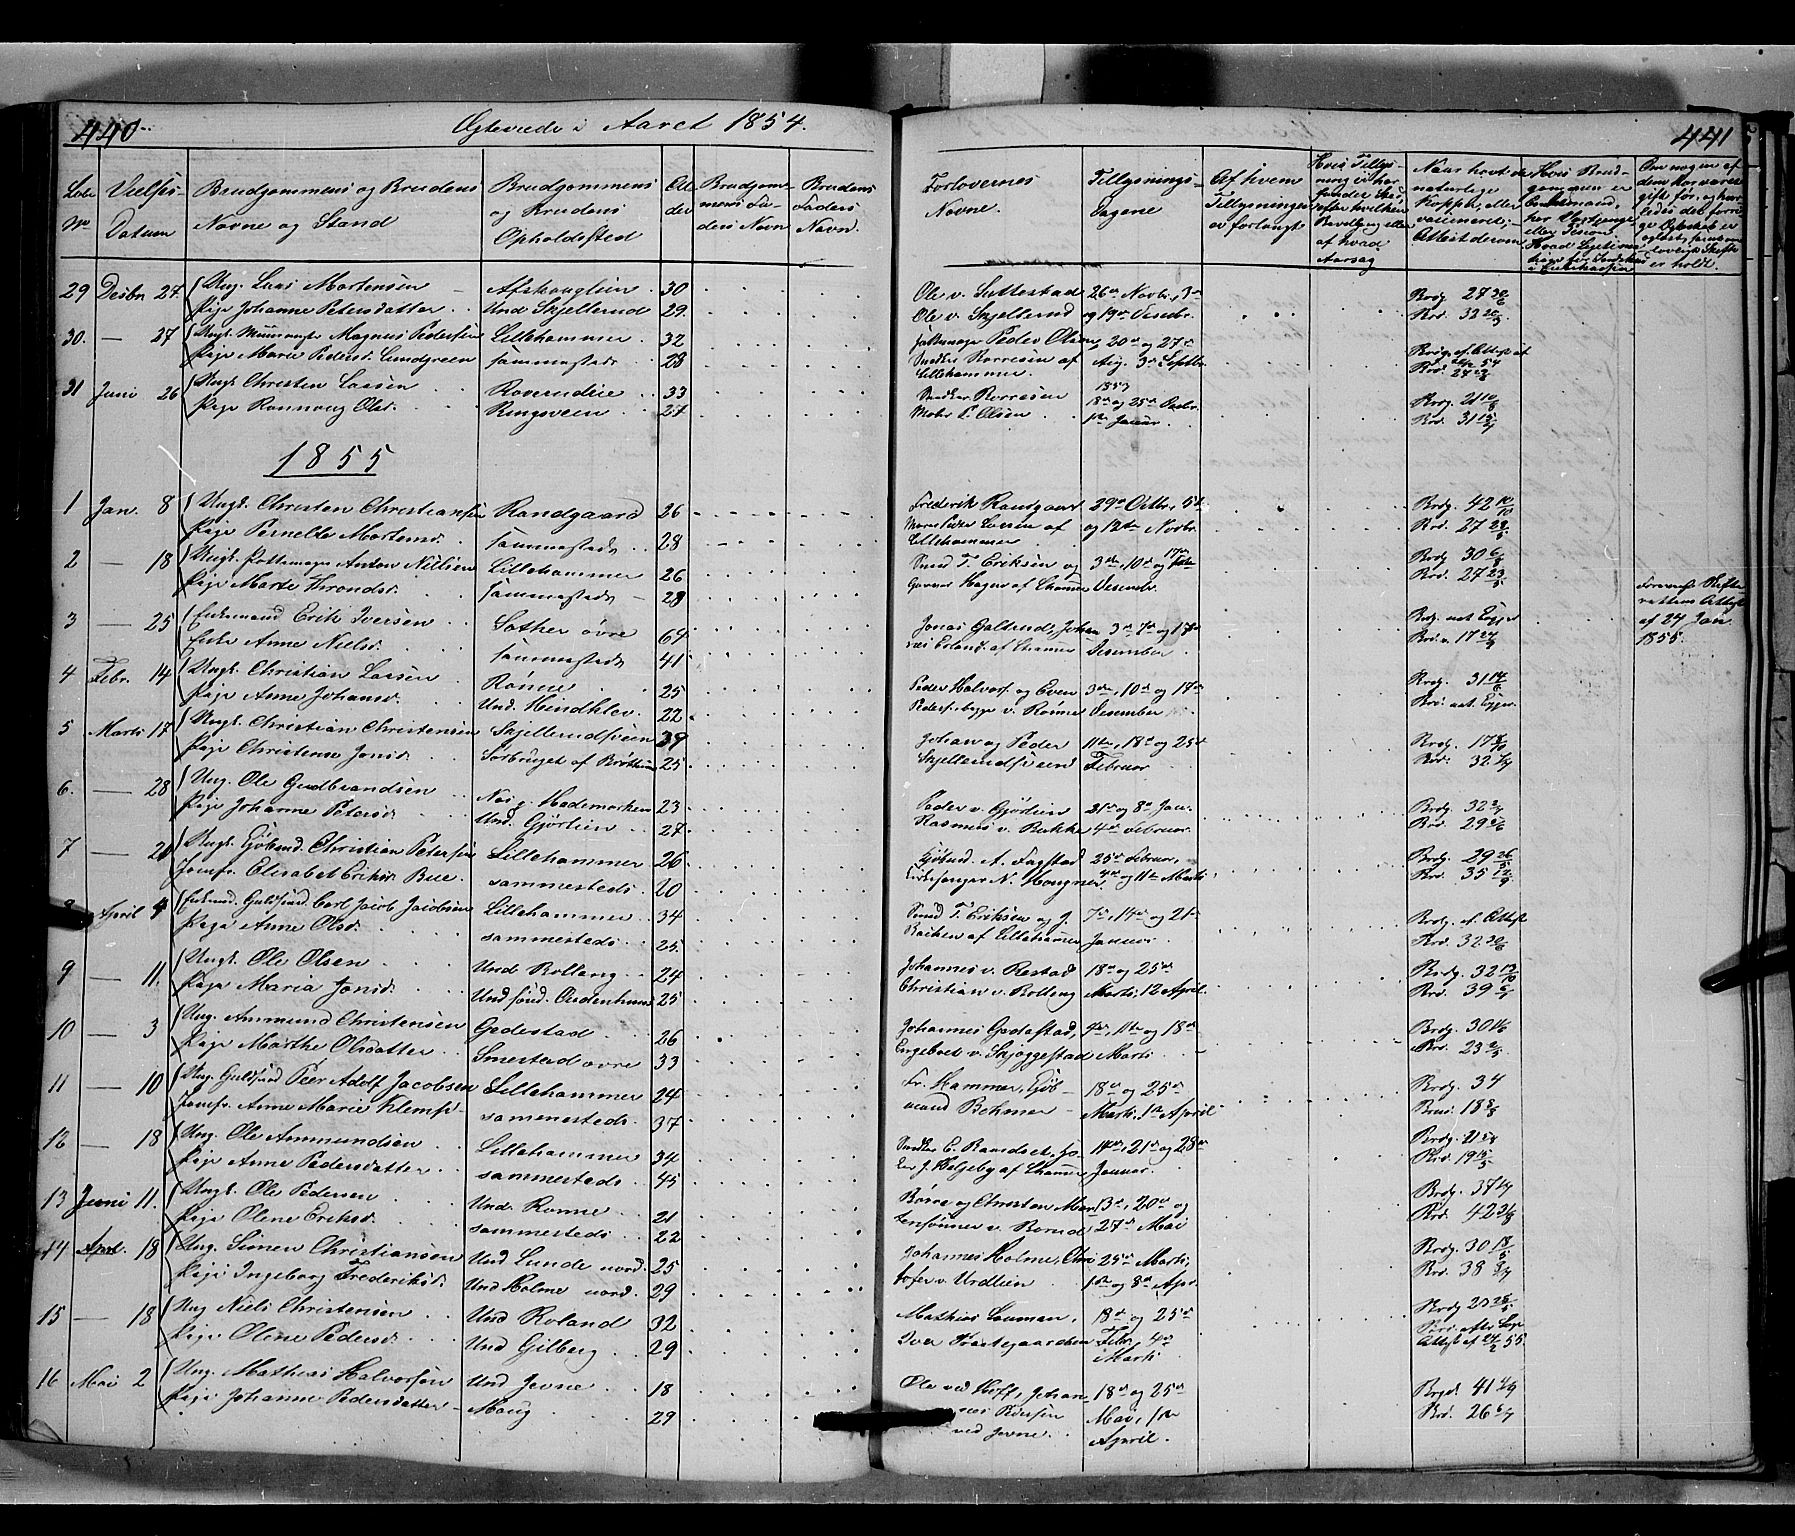 SAH, Fåberg prestekontor, Klokkerbok nr. 6, 1837-1855, s. 440-441